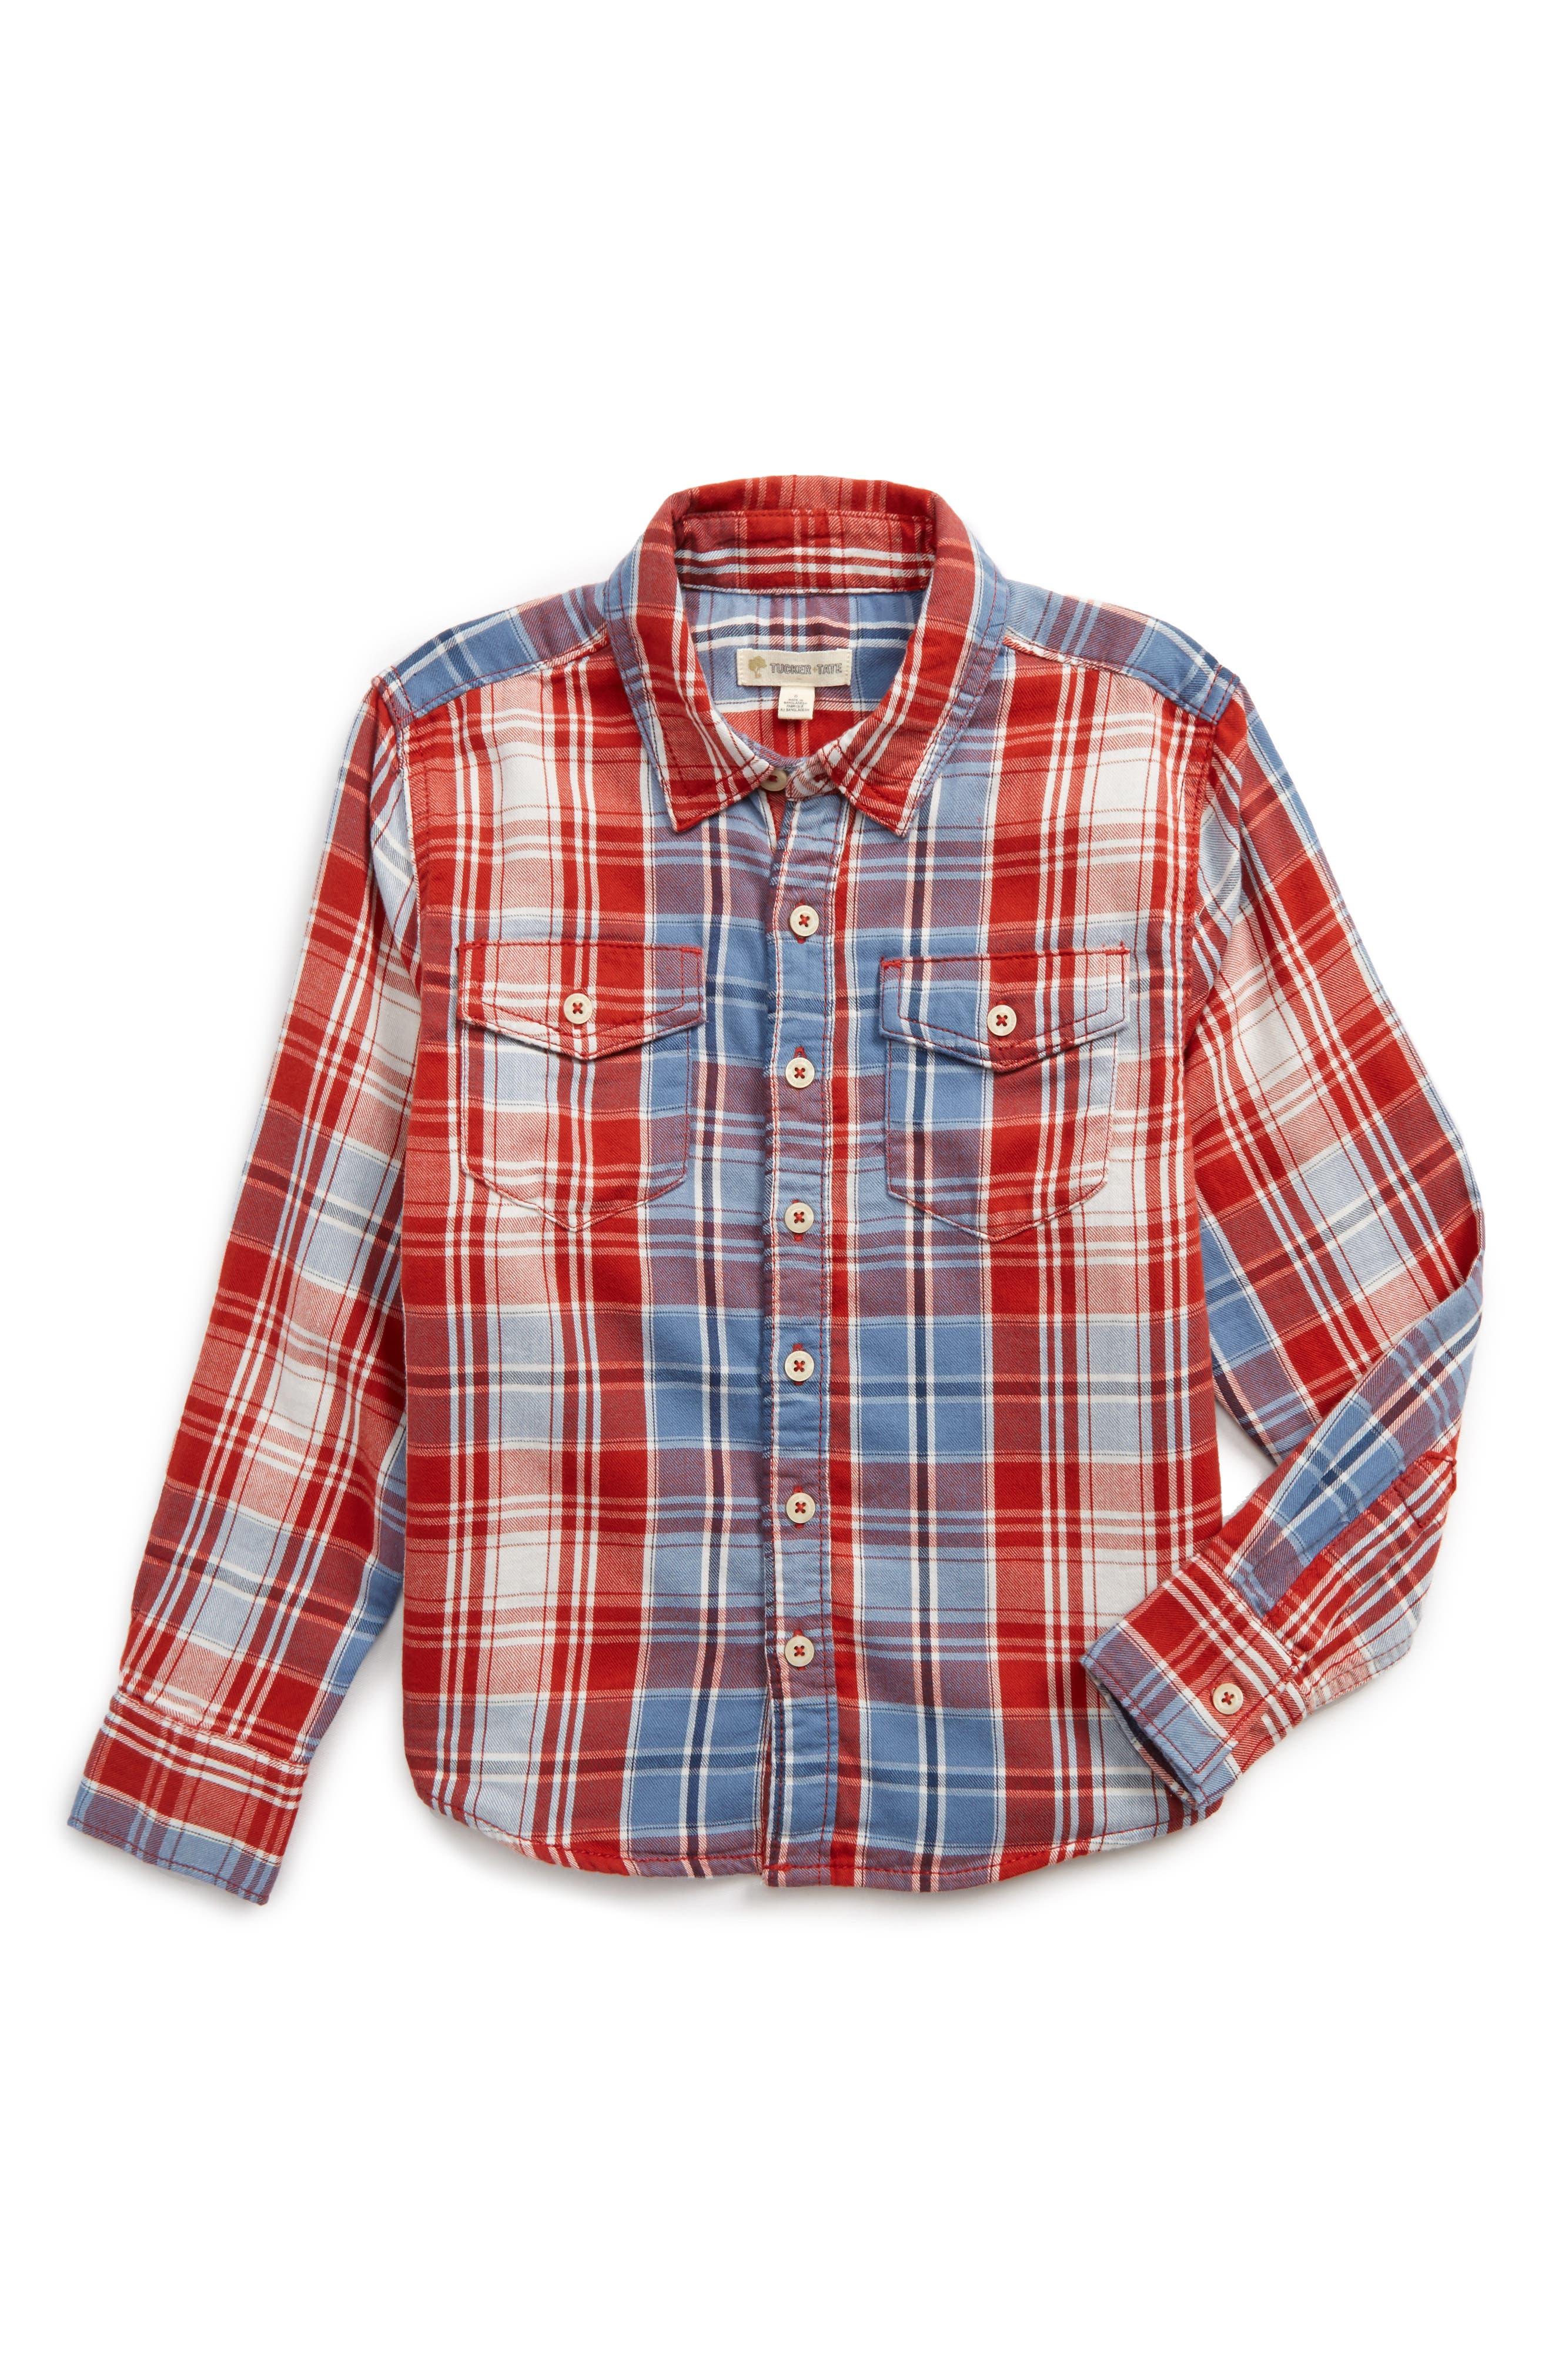 Alternate Image 1 Selected - Tucker + Tate Plaid Double Cloth Shirt (Toddler Boys & Little Boys)